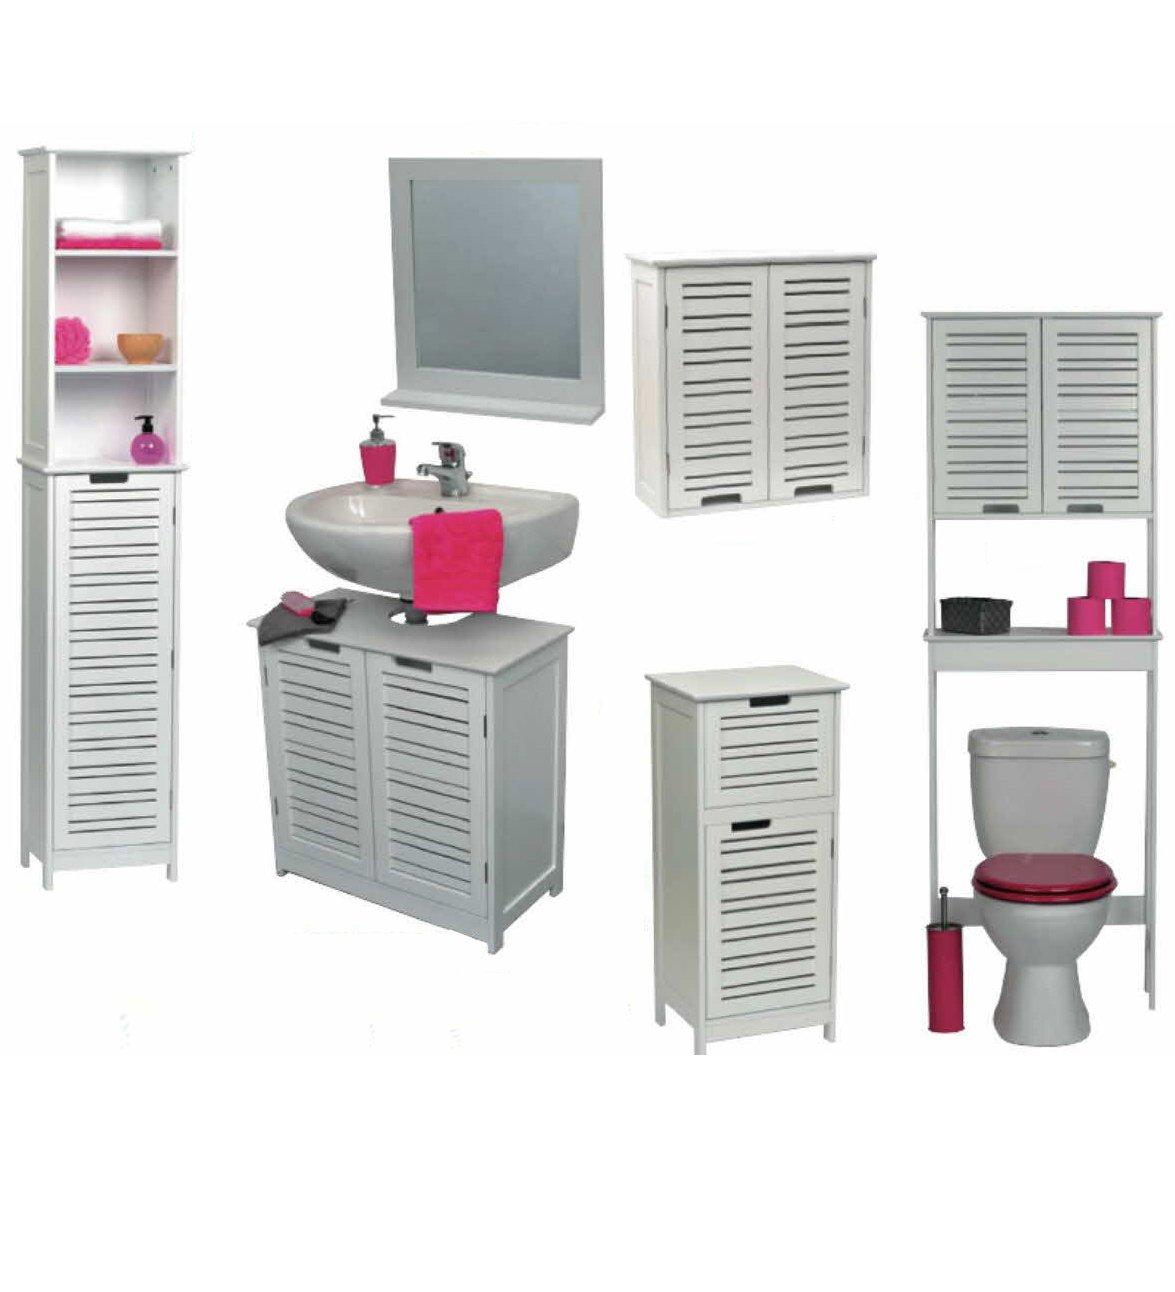 Amazon.com: EVIDECO Non Pedestal Bath Under Sink Storage Vanity ...